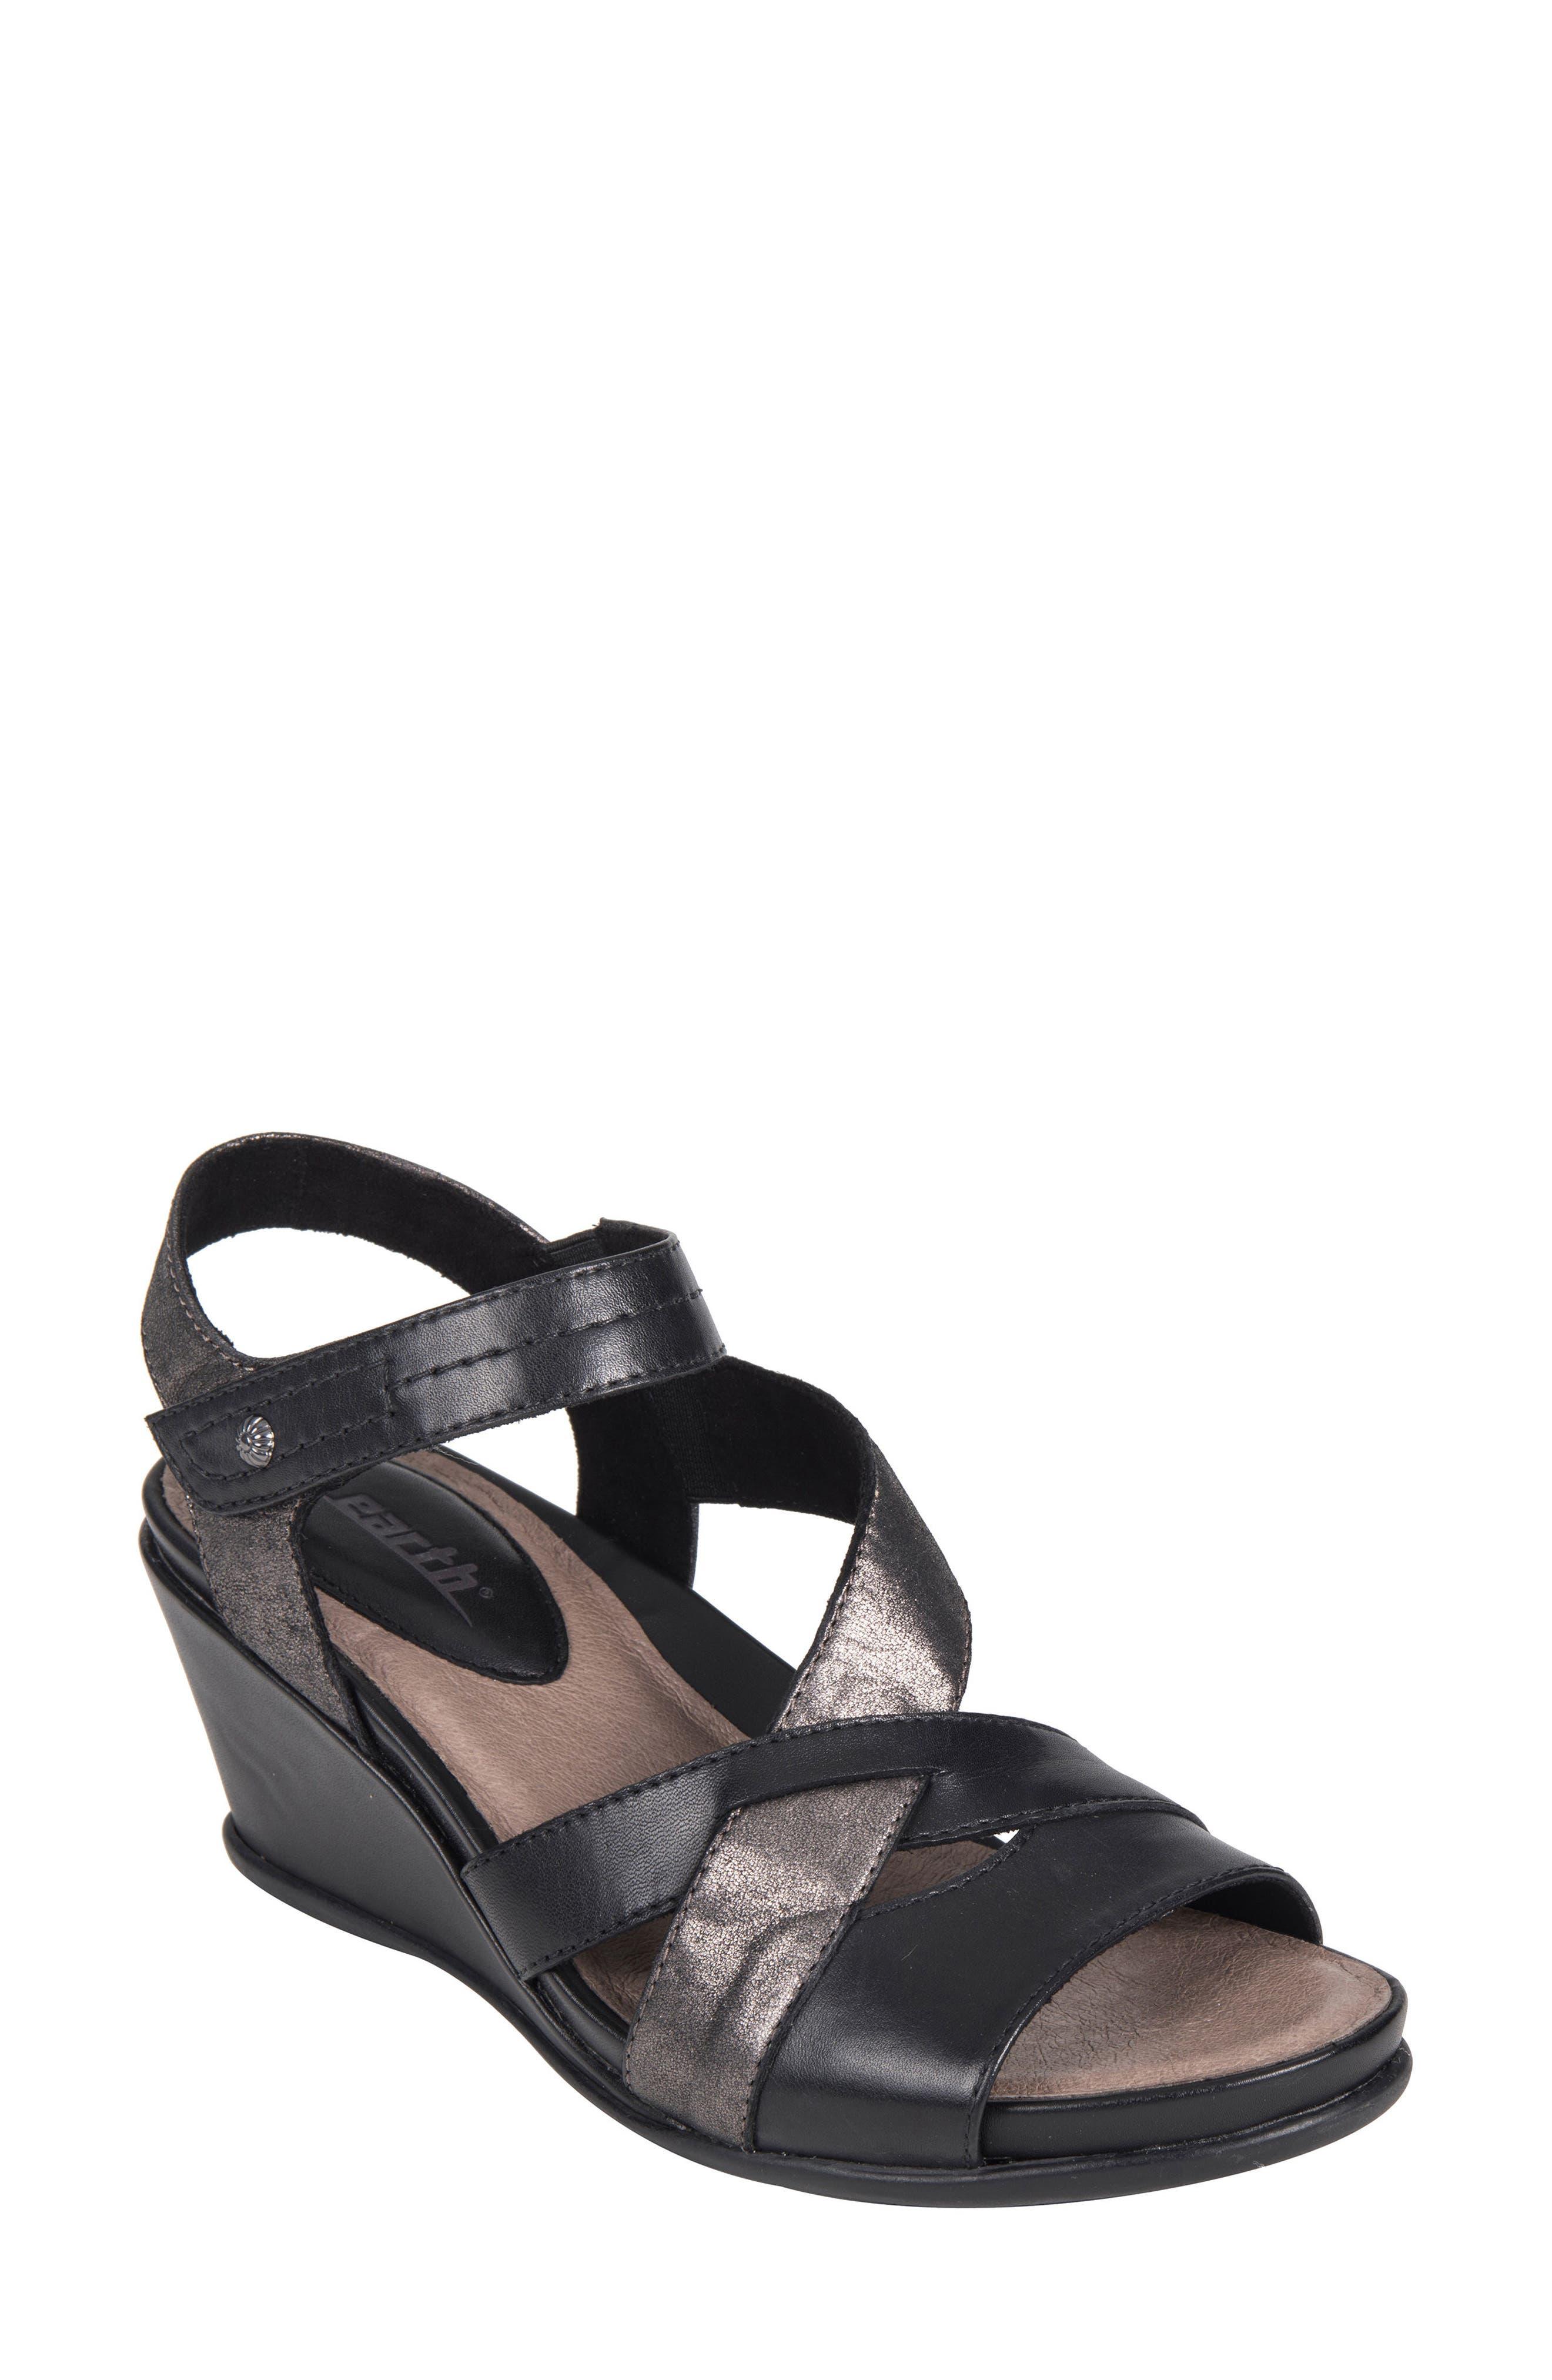 Thistle Wedge Sandal,                             Main thumbnail 1, color,                             001